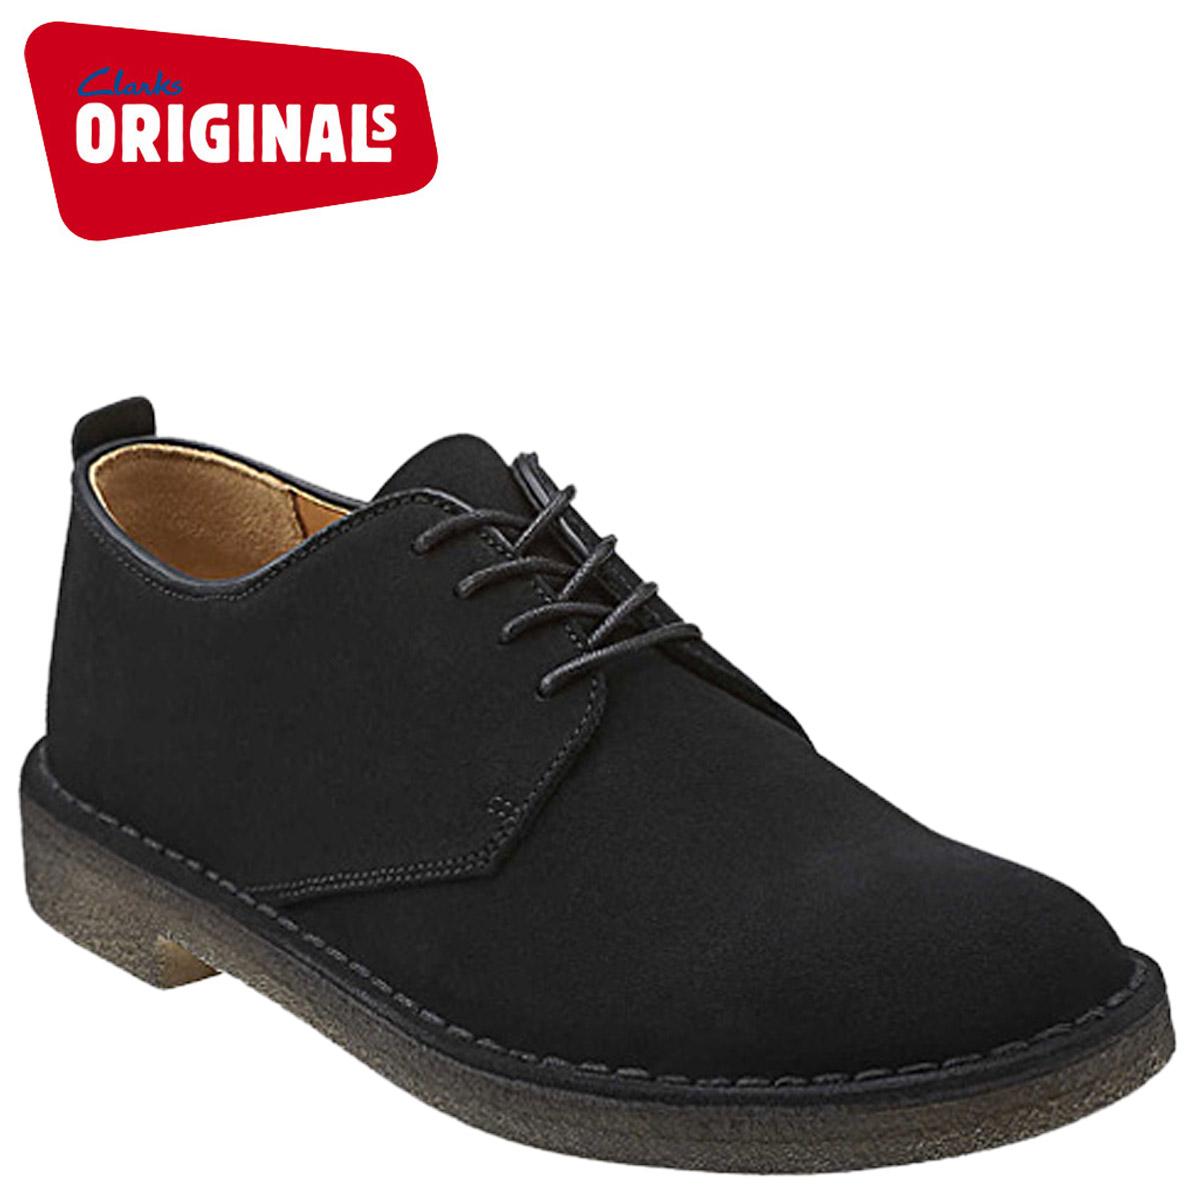 SOLD OUT  Clarks originals Clarks ORIGINALS desert London lace-up shoes   Black  66008 DESERT LONDON suede men s suede  regular  b0b38c65ebfd